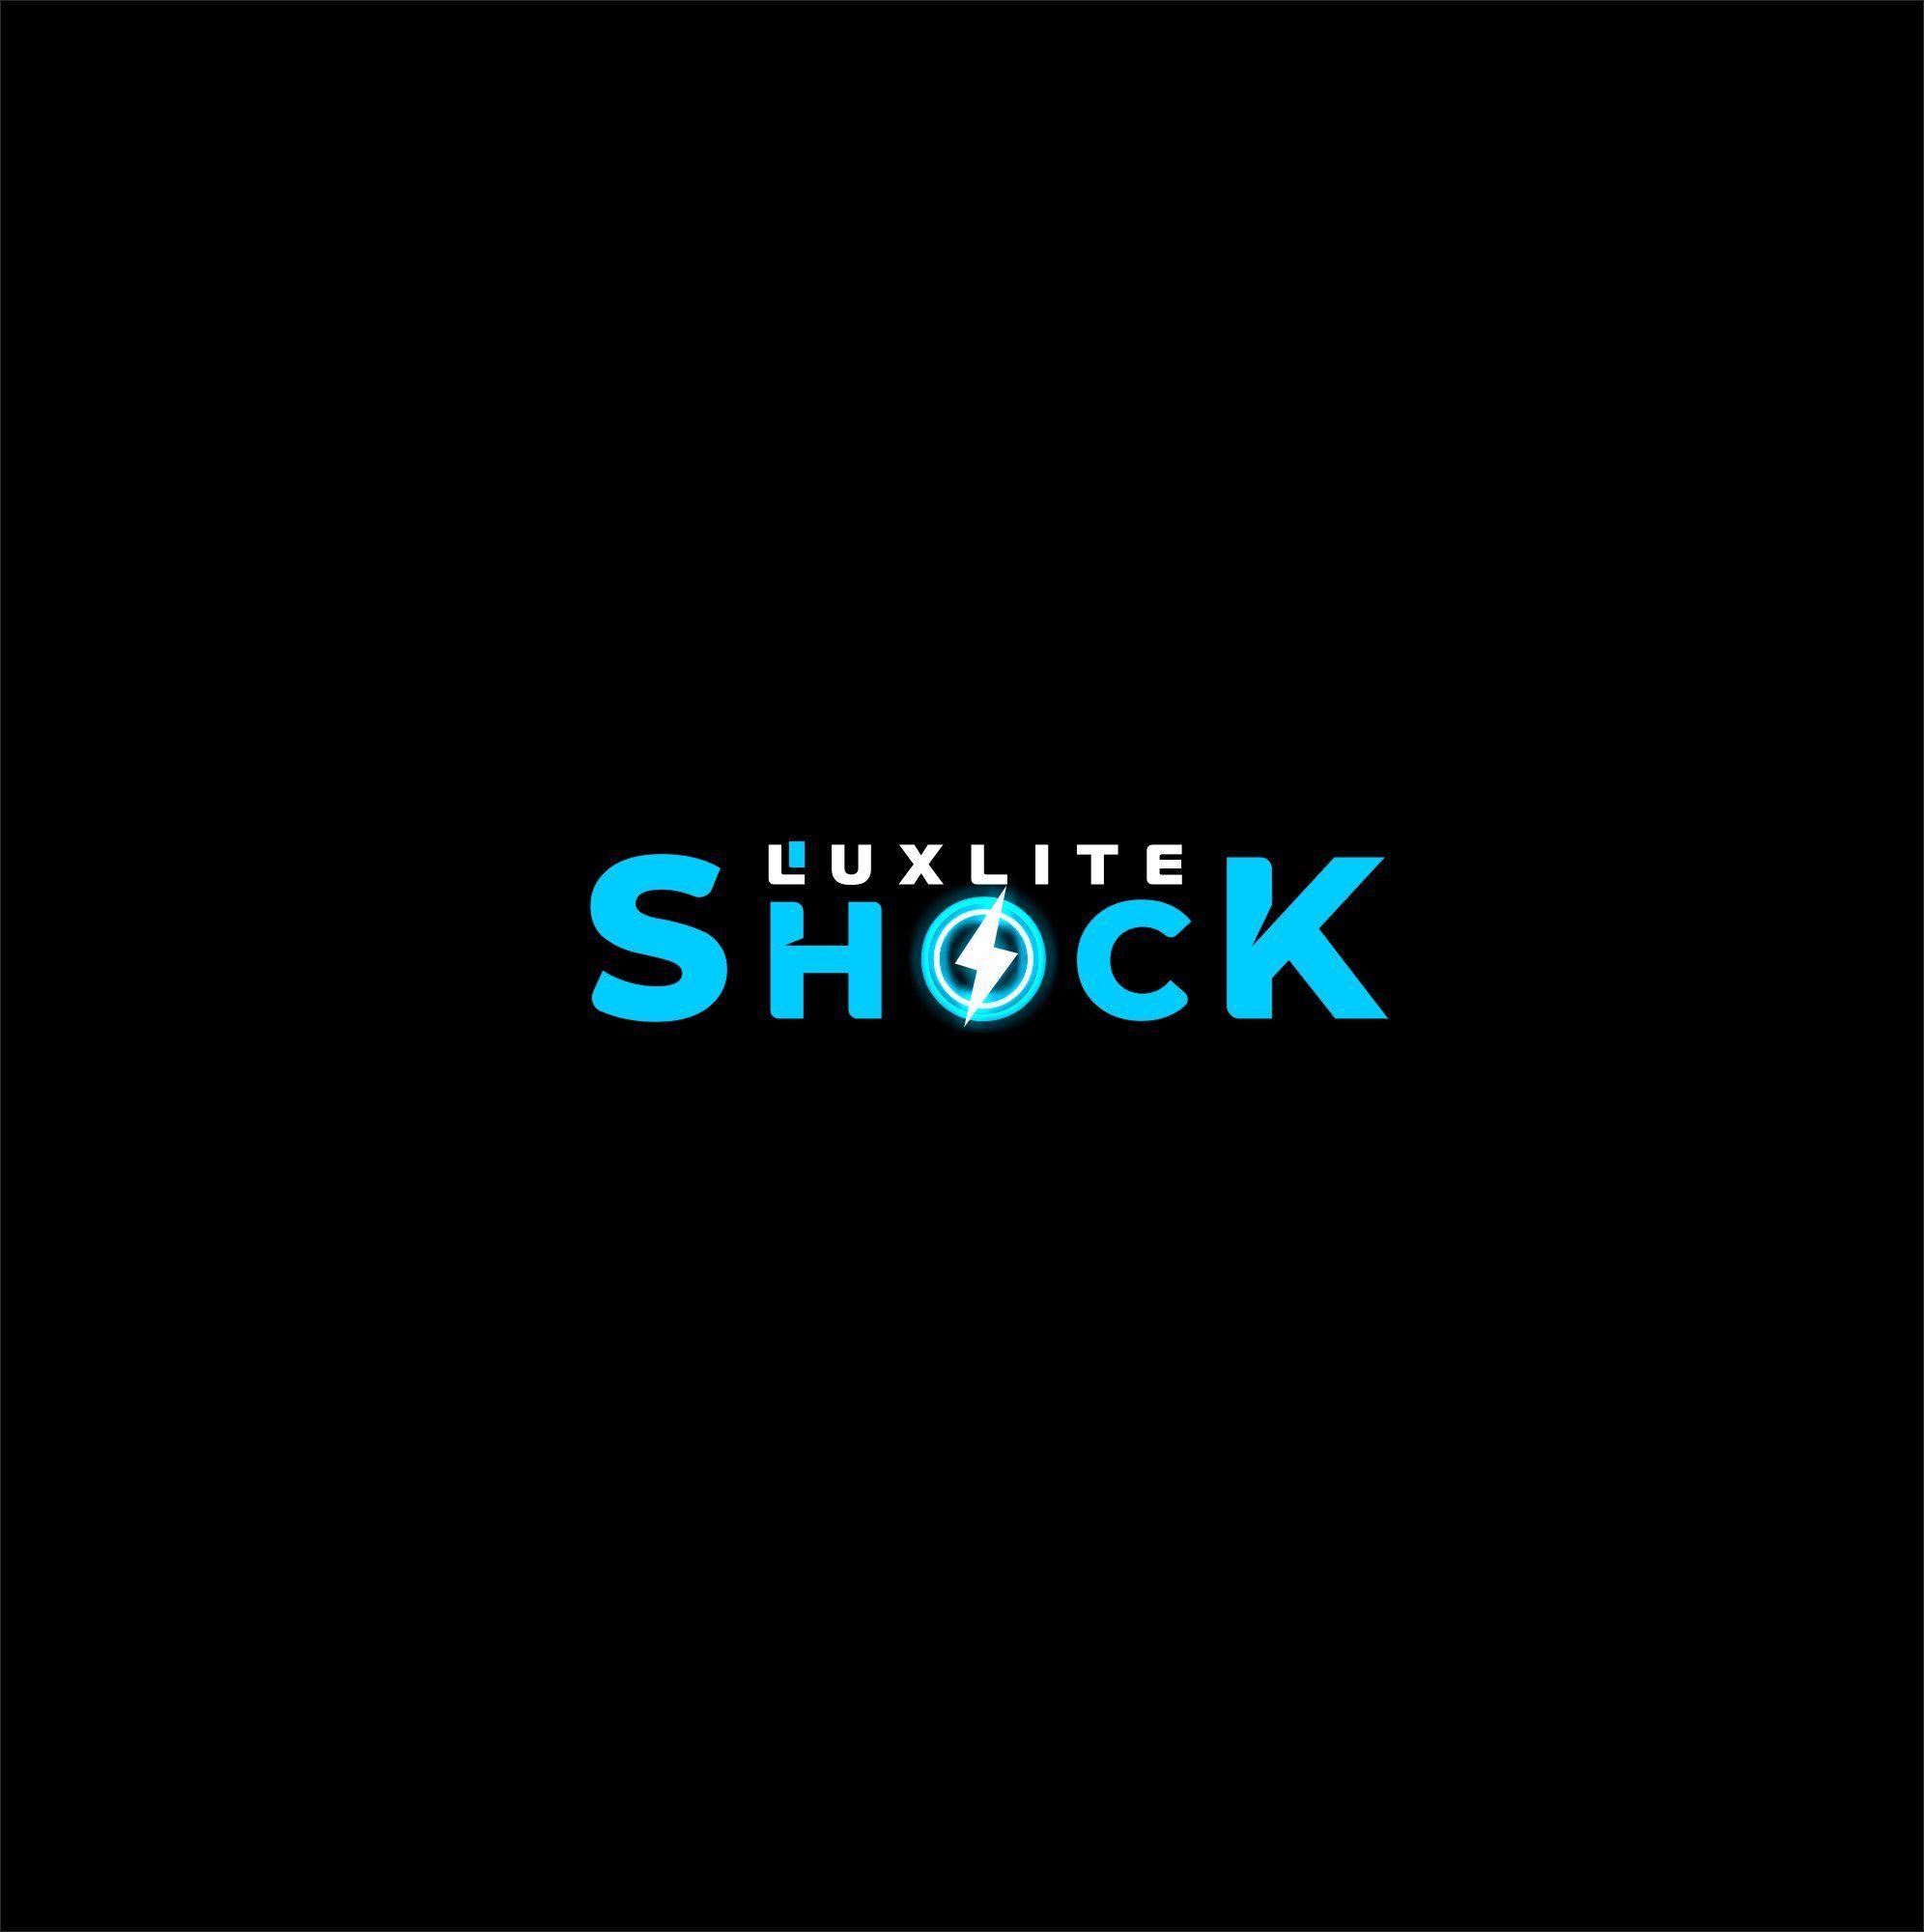 Логотип для батареек LUXLITE SHOCK - дизайнер salik